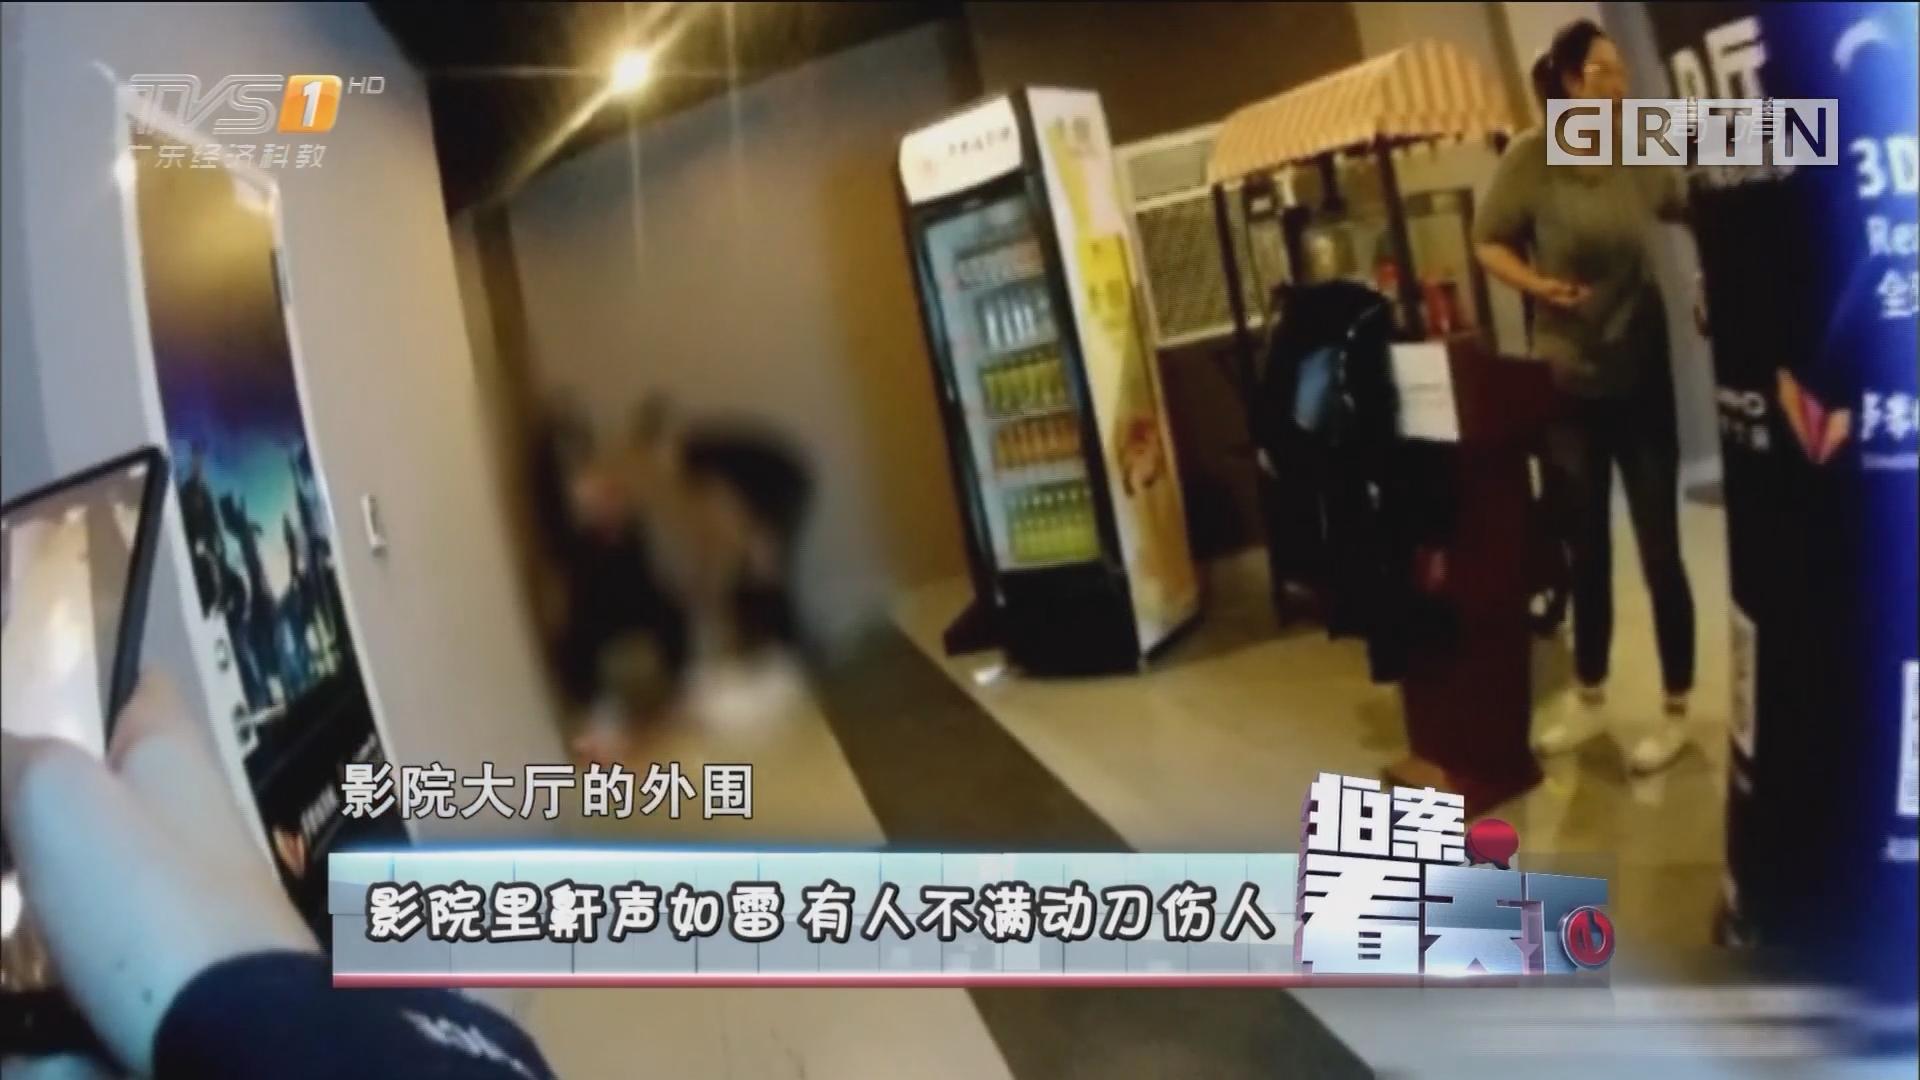 [HD][2017-11-15]拍案看天下:影院里鼾声如雷 有人不满动刀伤人